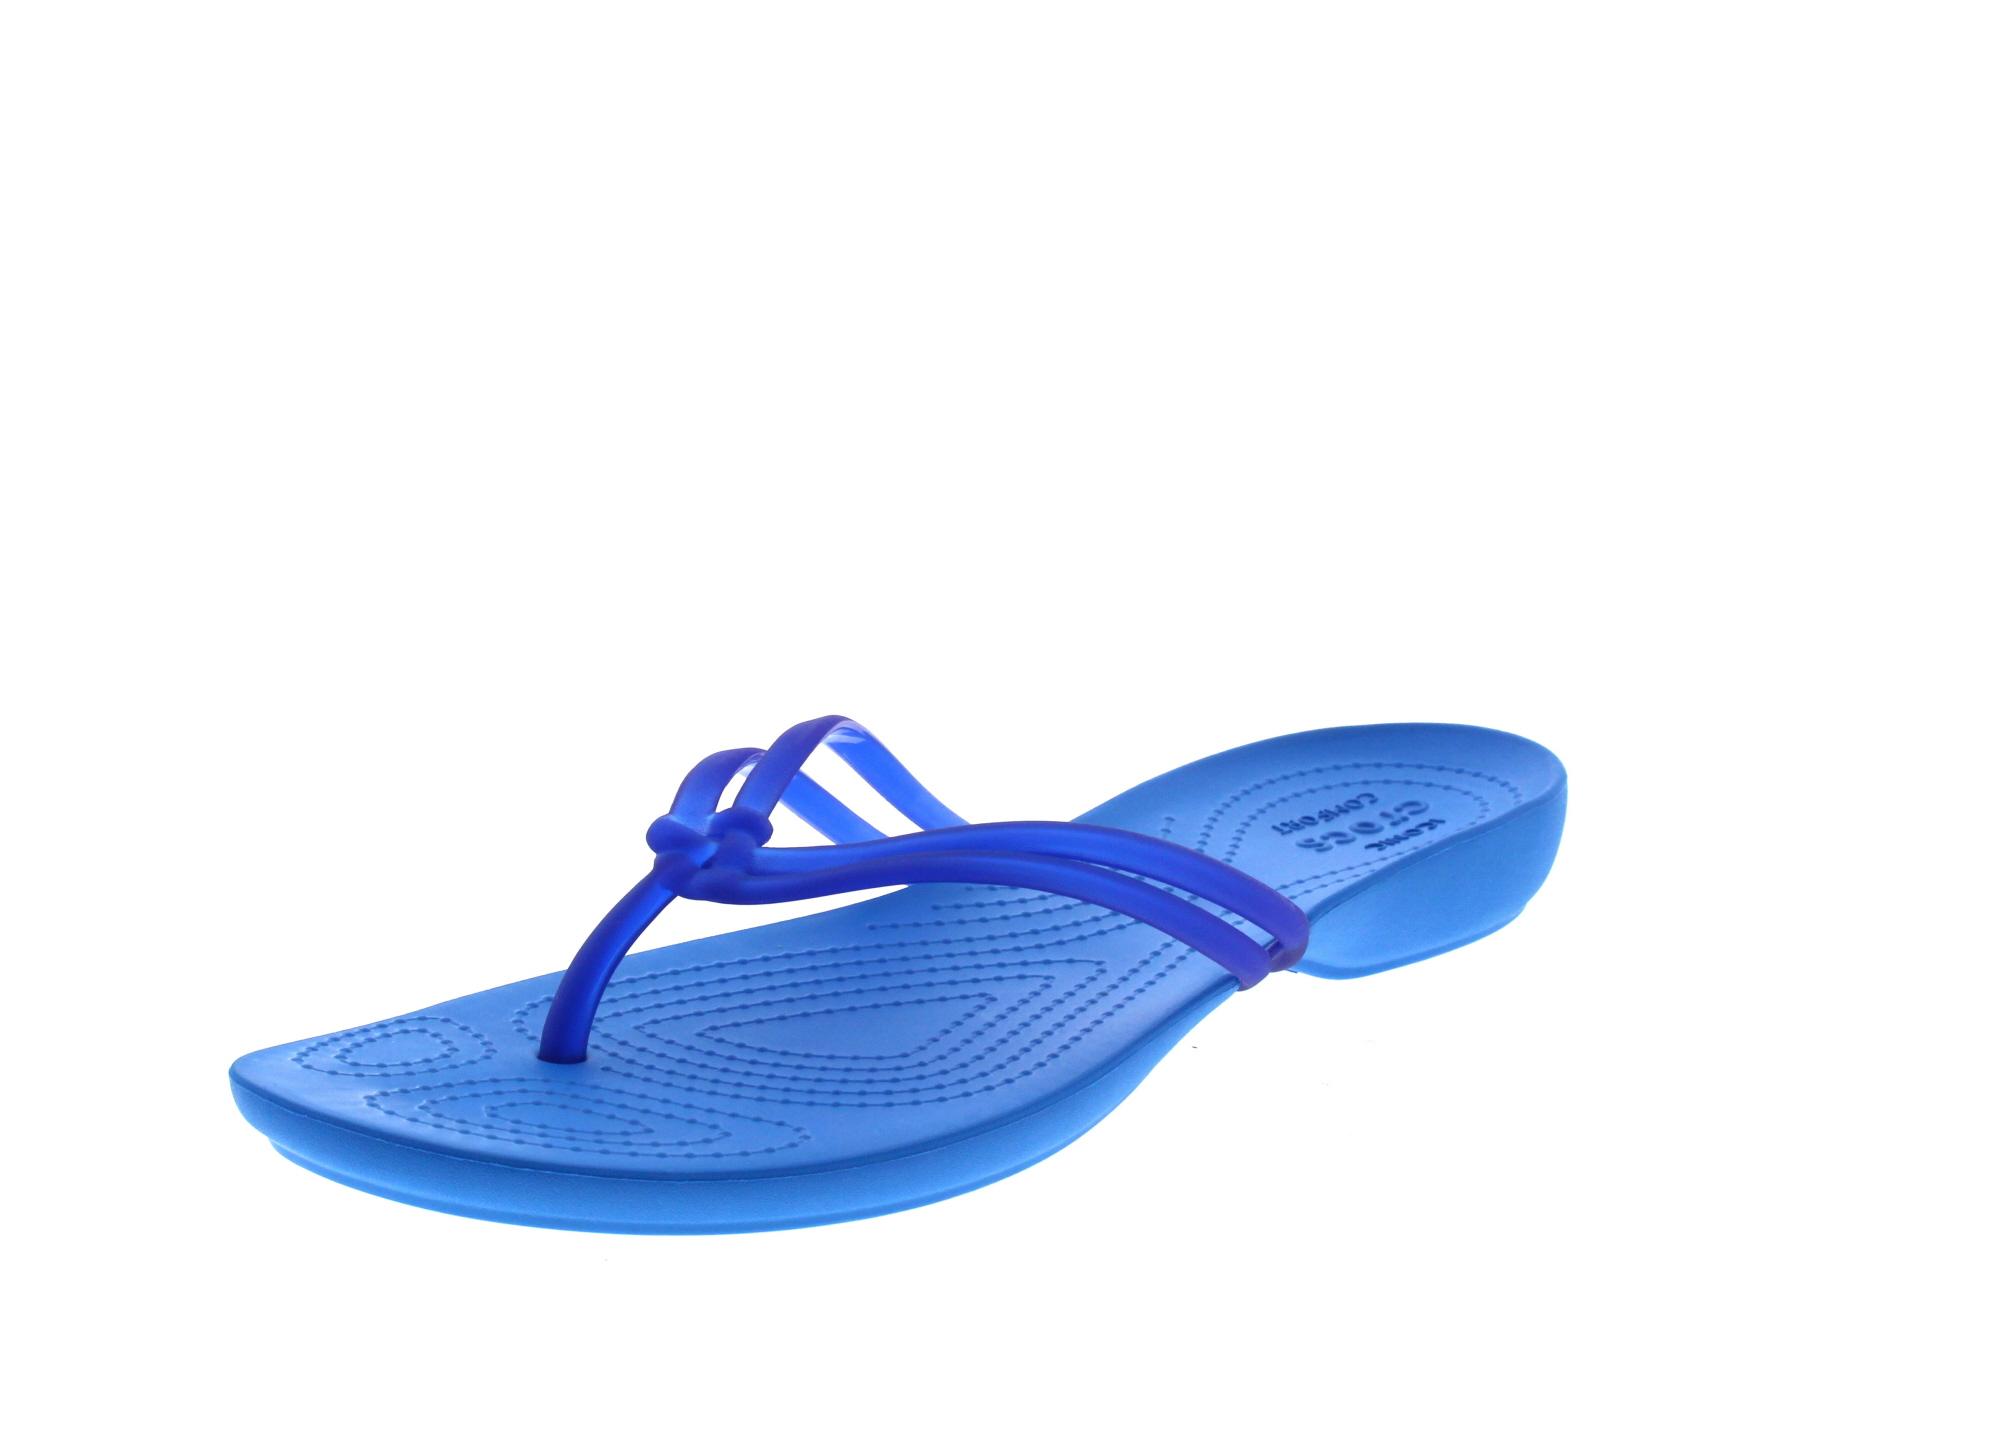 CROCS Schuhe - Zehentrenner ISABELLA FLIP - cerulan ocean0